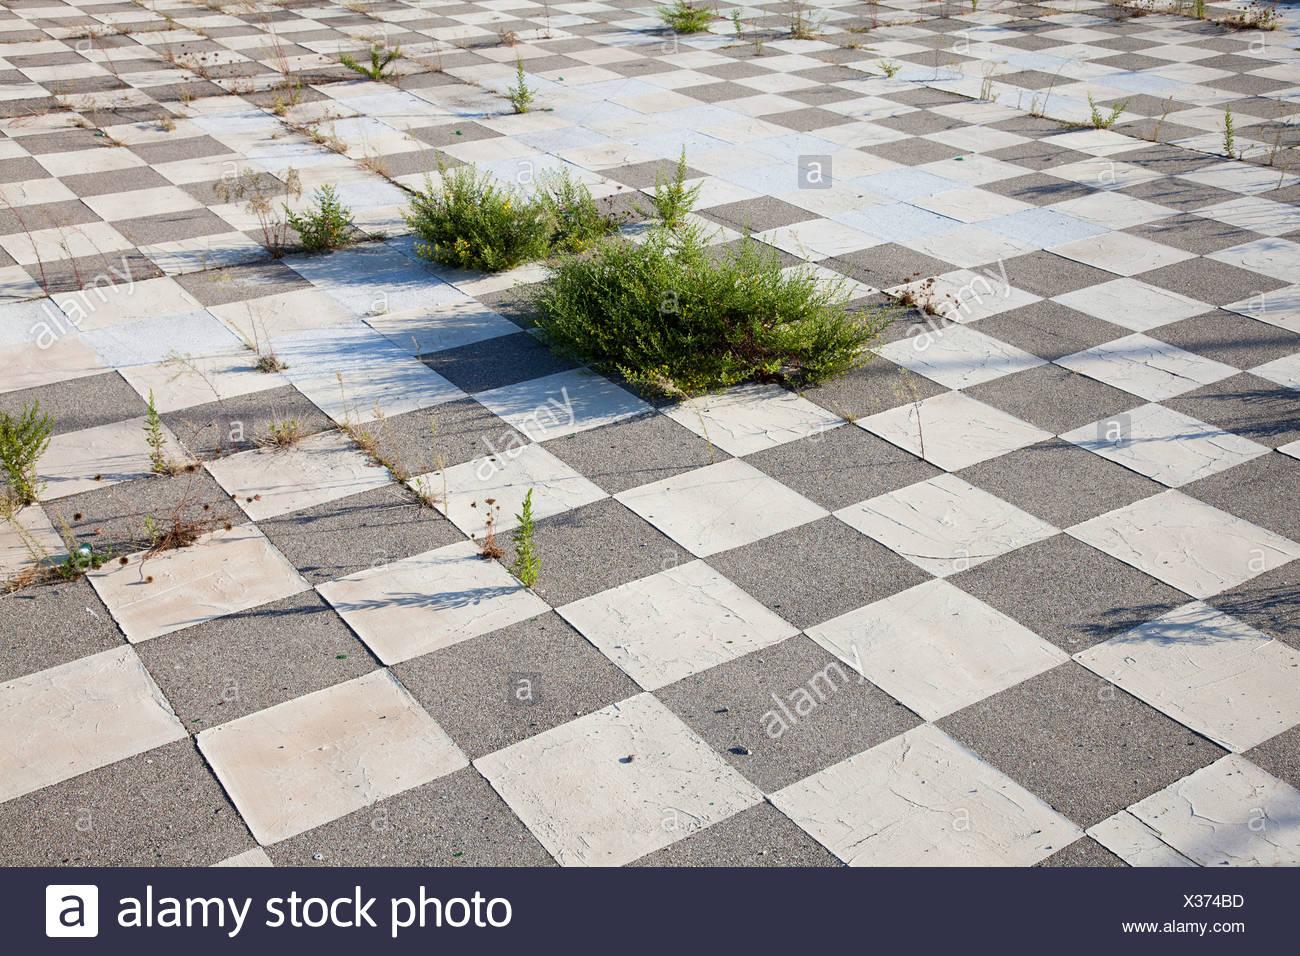 Plants growing through tiled floor - Stock Image